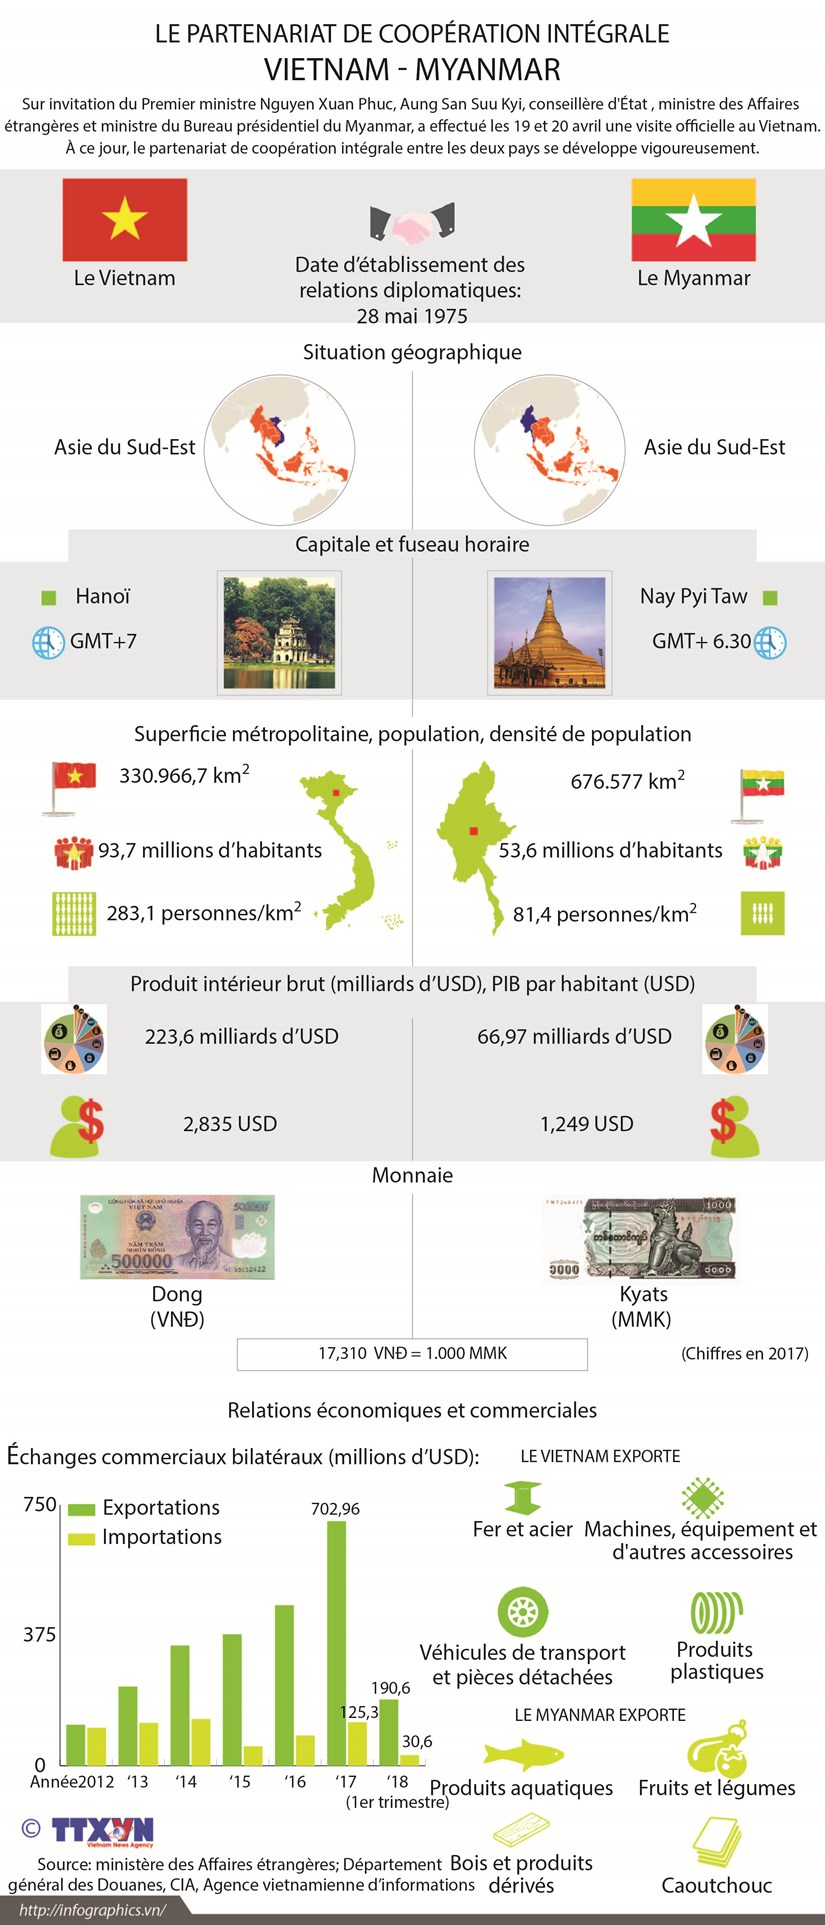 Le partenariat de cooperation integrale Vietnam-Myanmar hinh anh 1